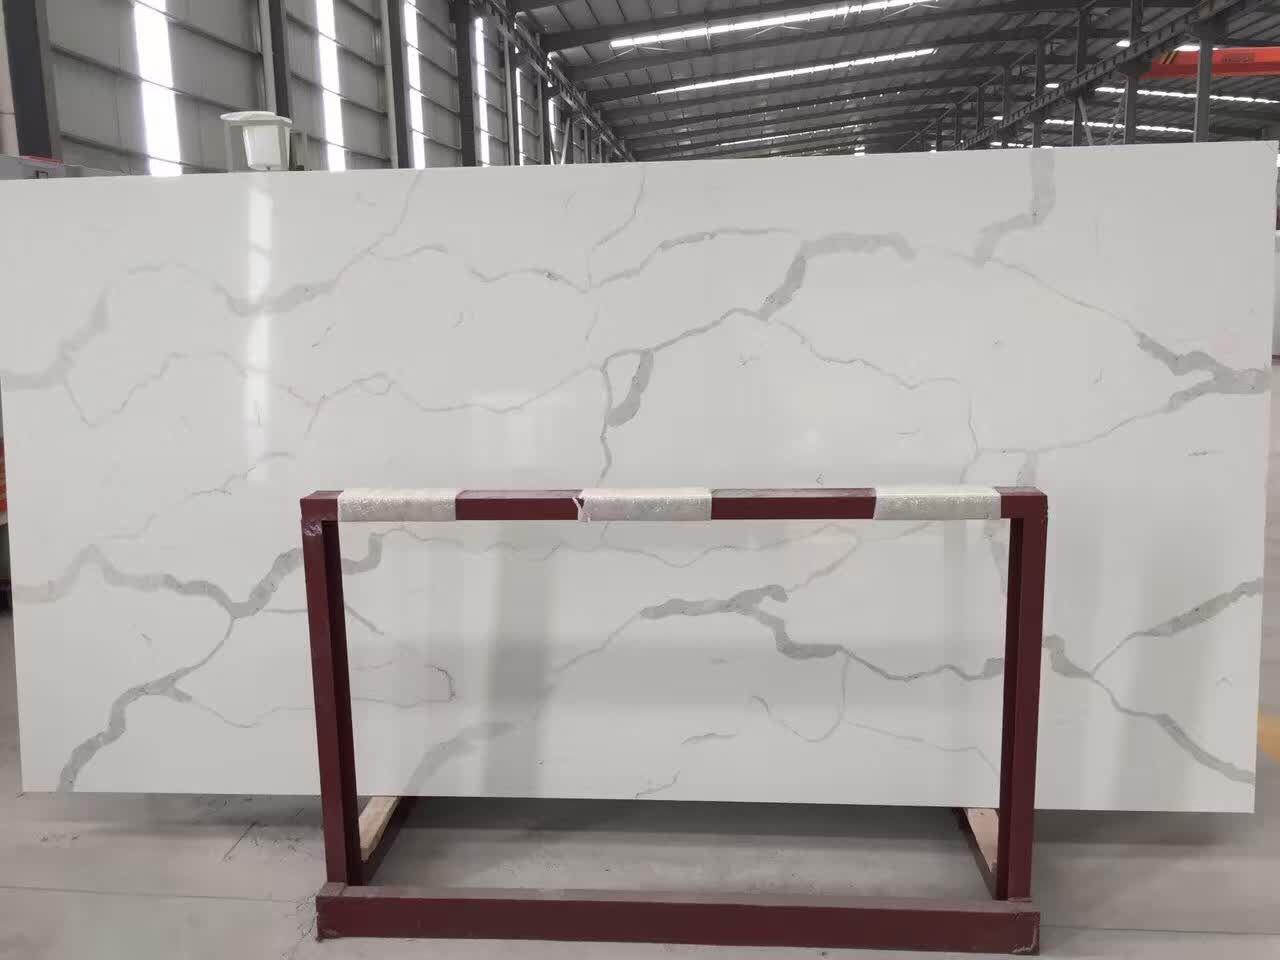 New calacatta style quartz stone